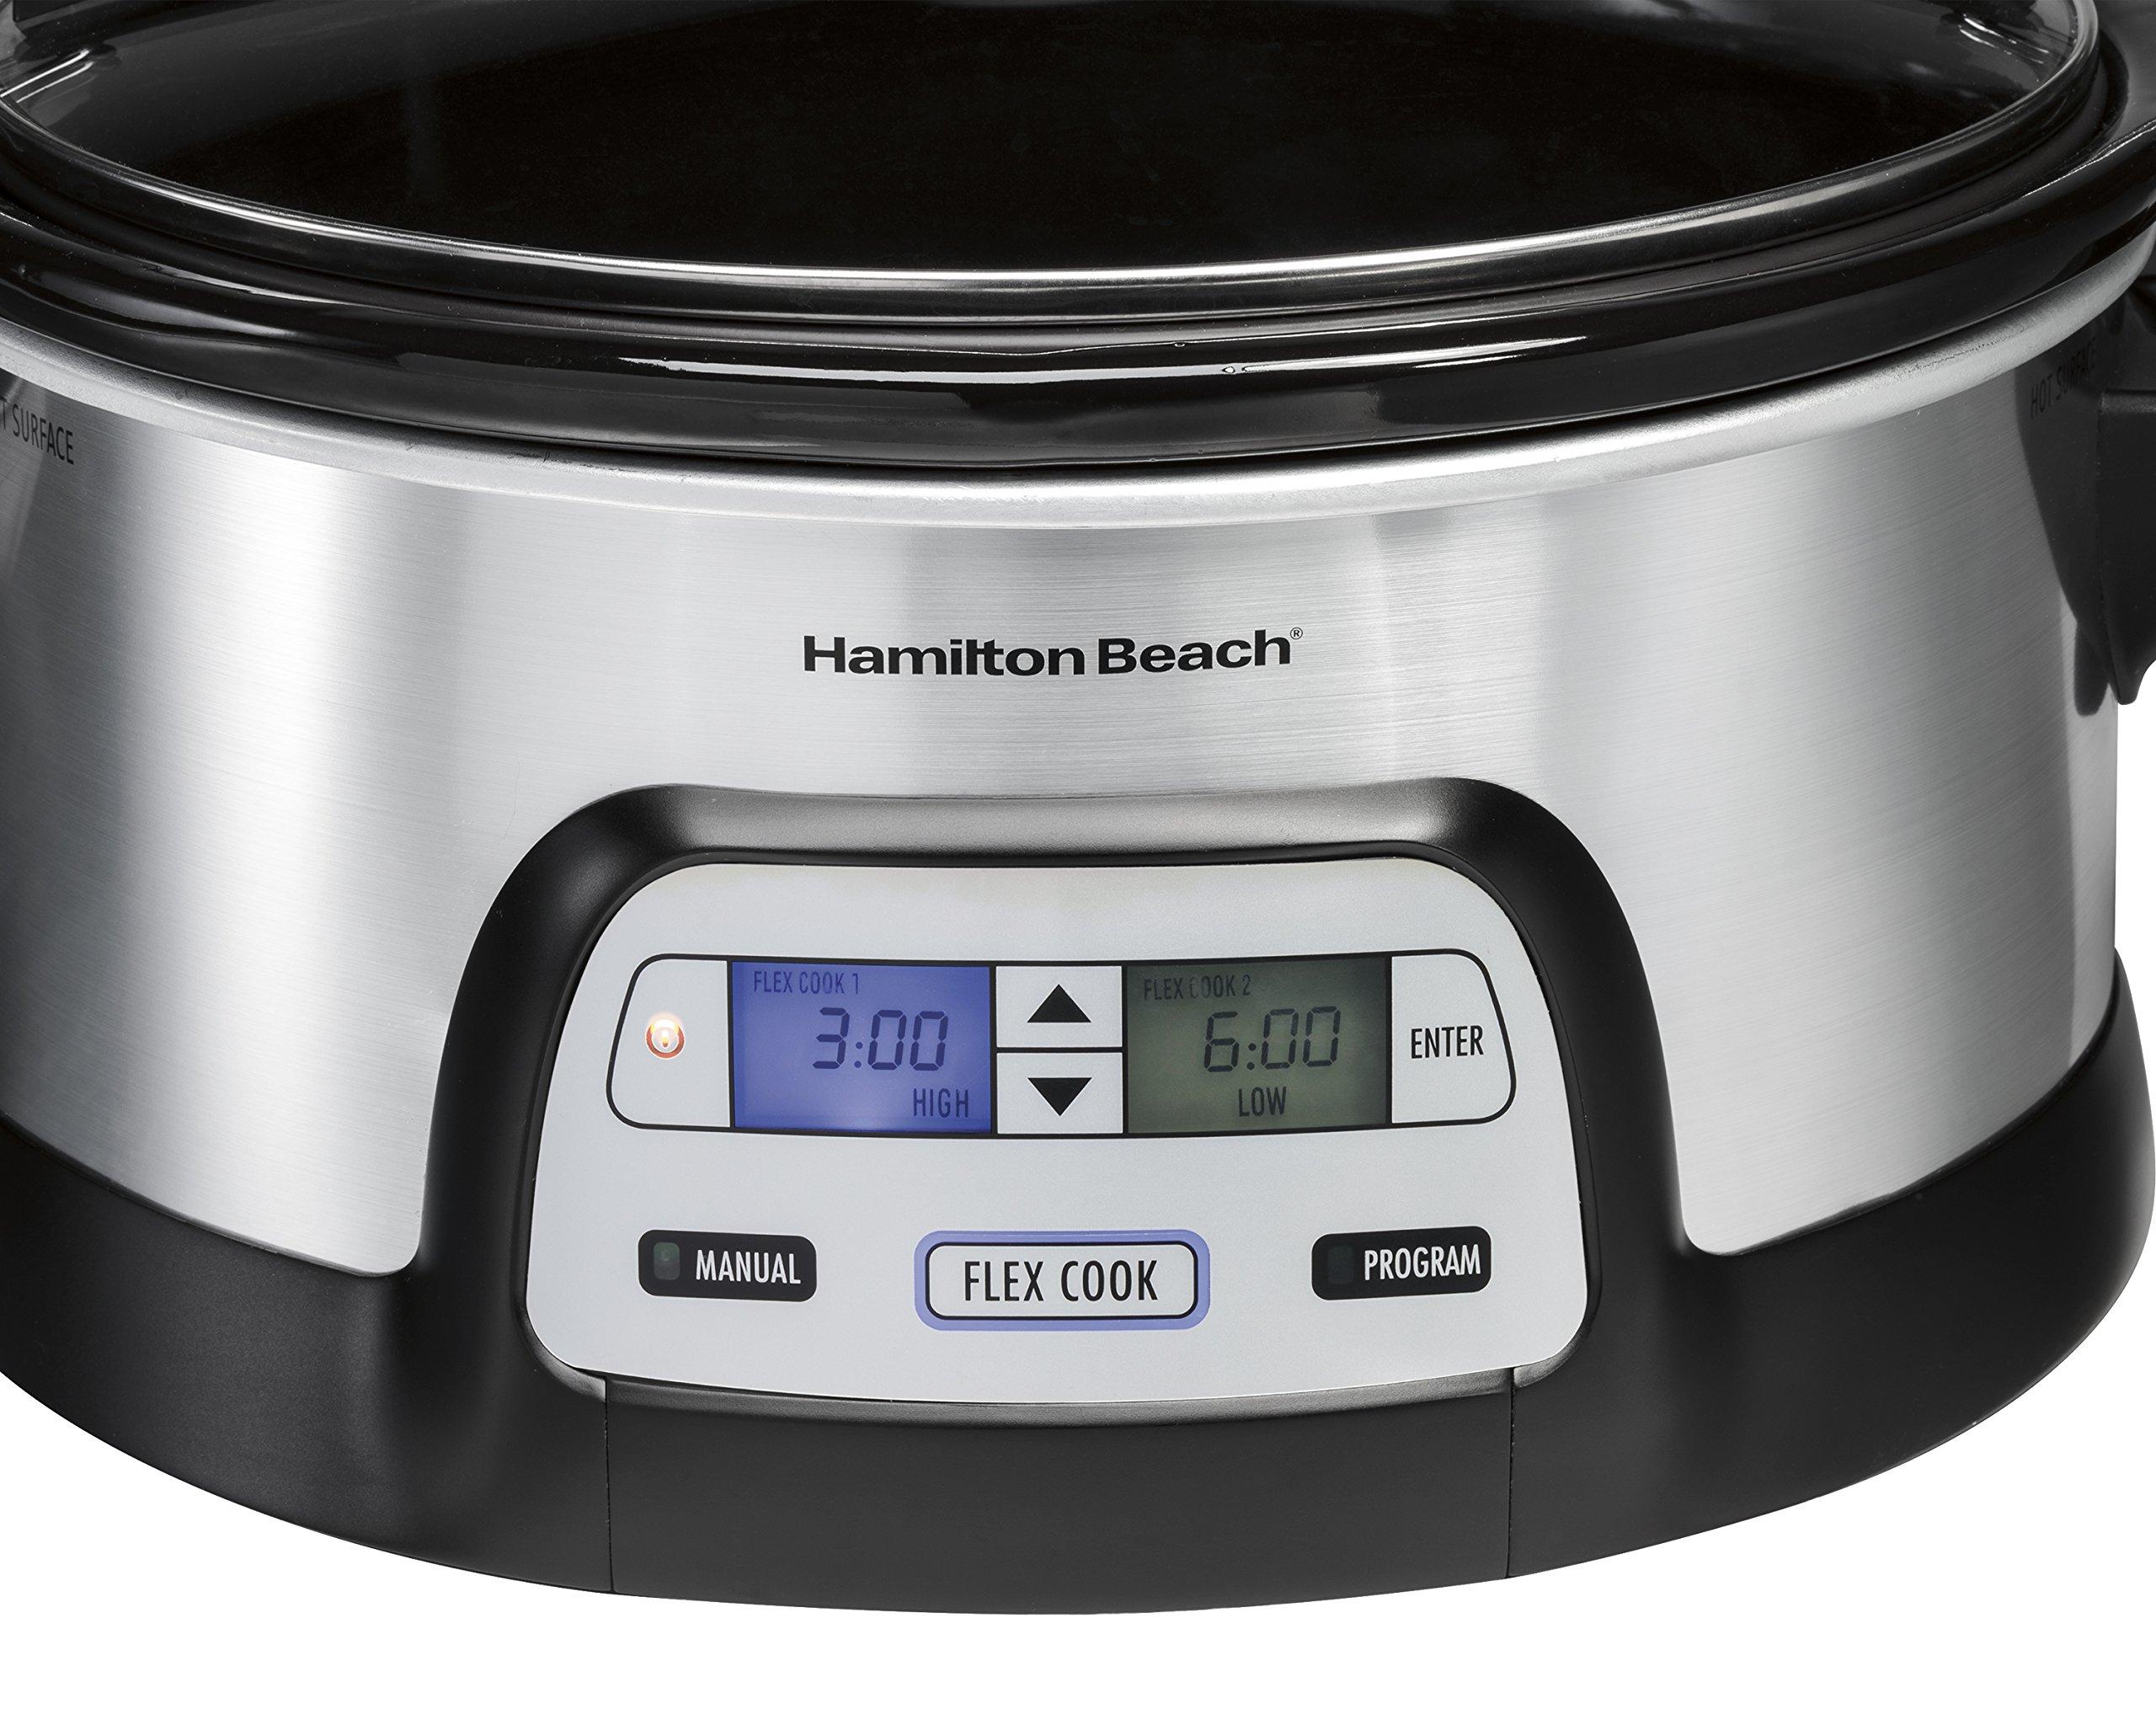 Hamilton Beach 33861 Programmable Slow Cooker, 6 Quart, Dual Digital Timer, Stainless Steel by Hamilton Beach (Image #3)